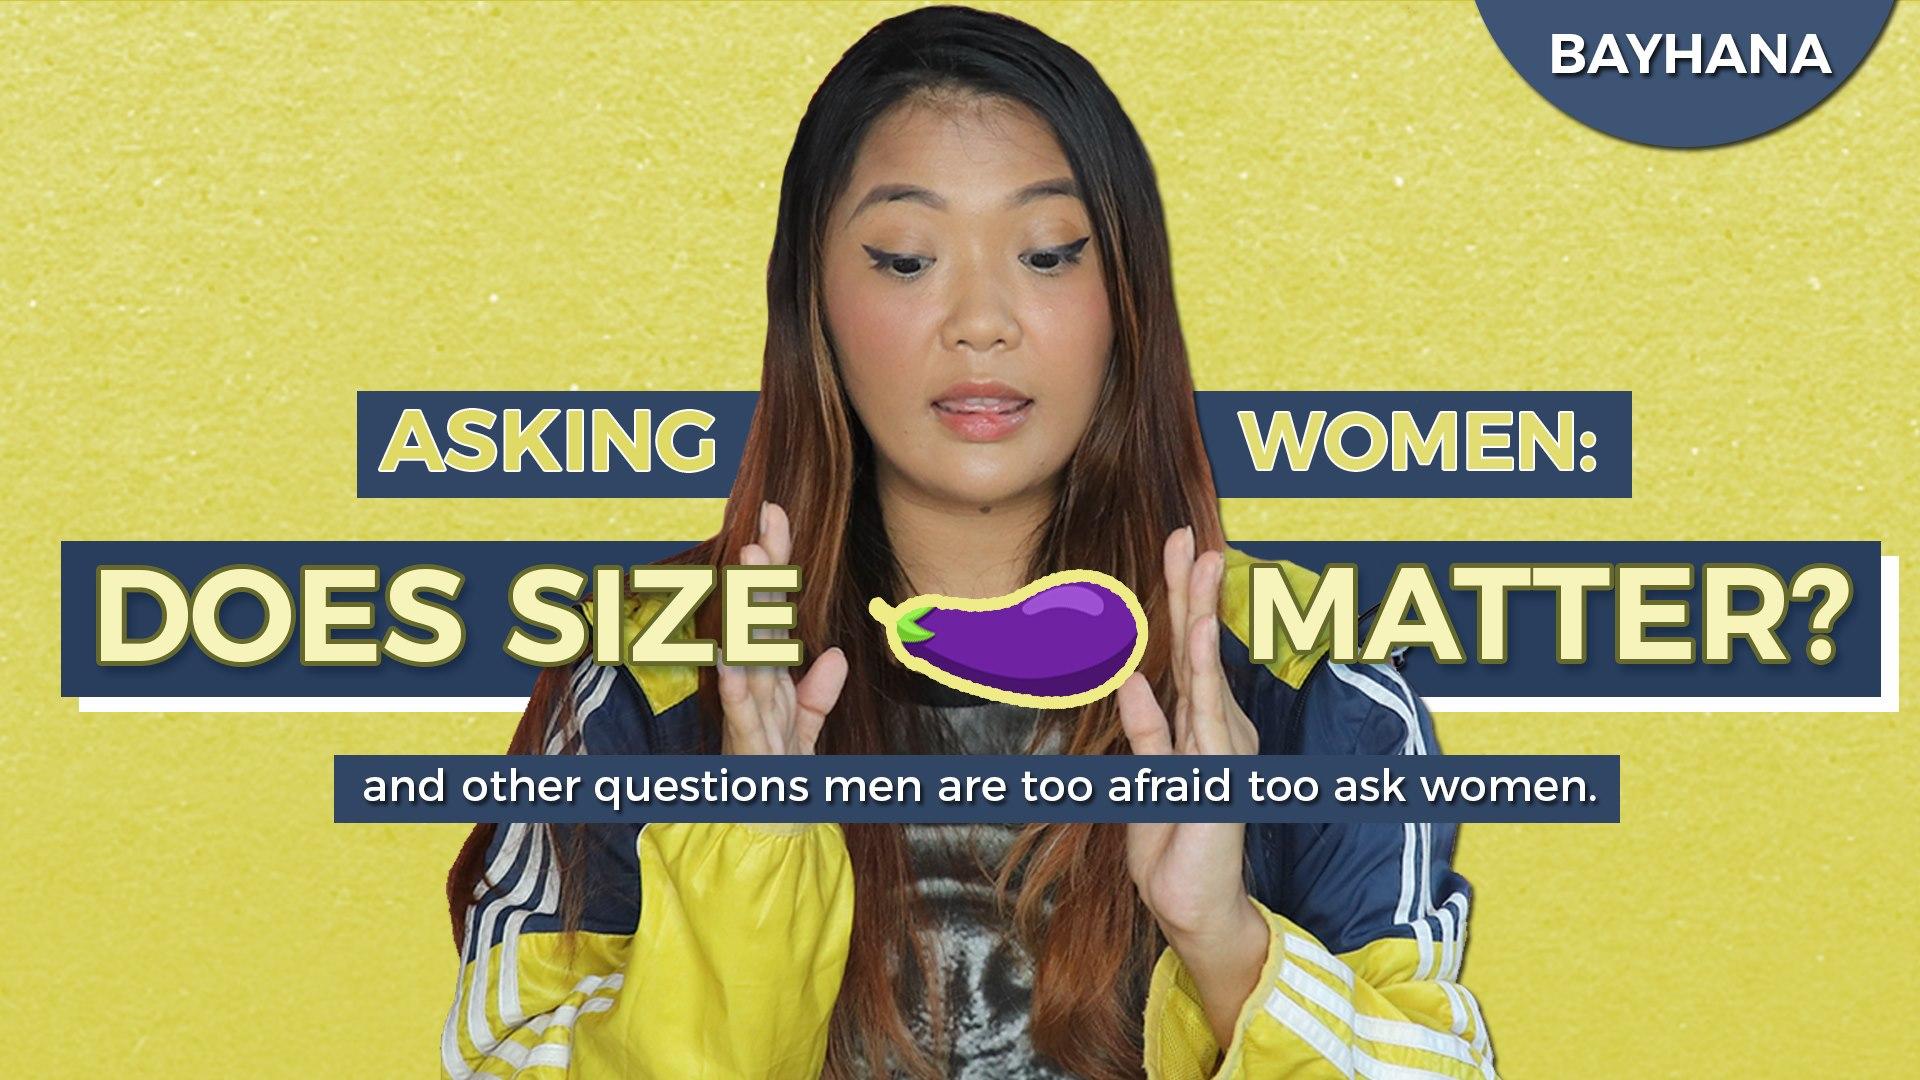 BAYHANA| Does Size Matter?